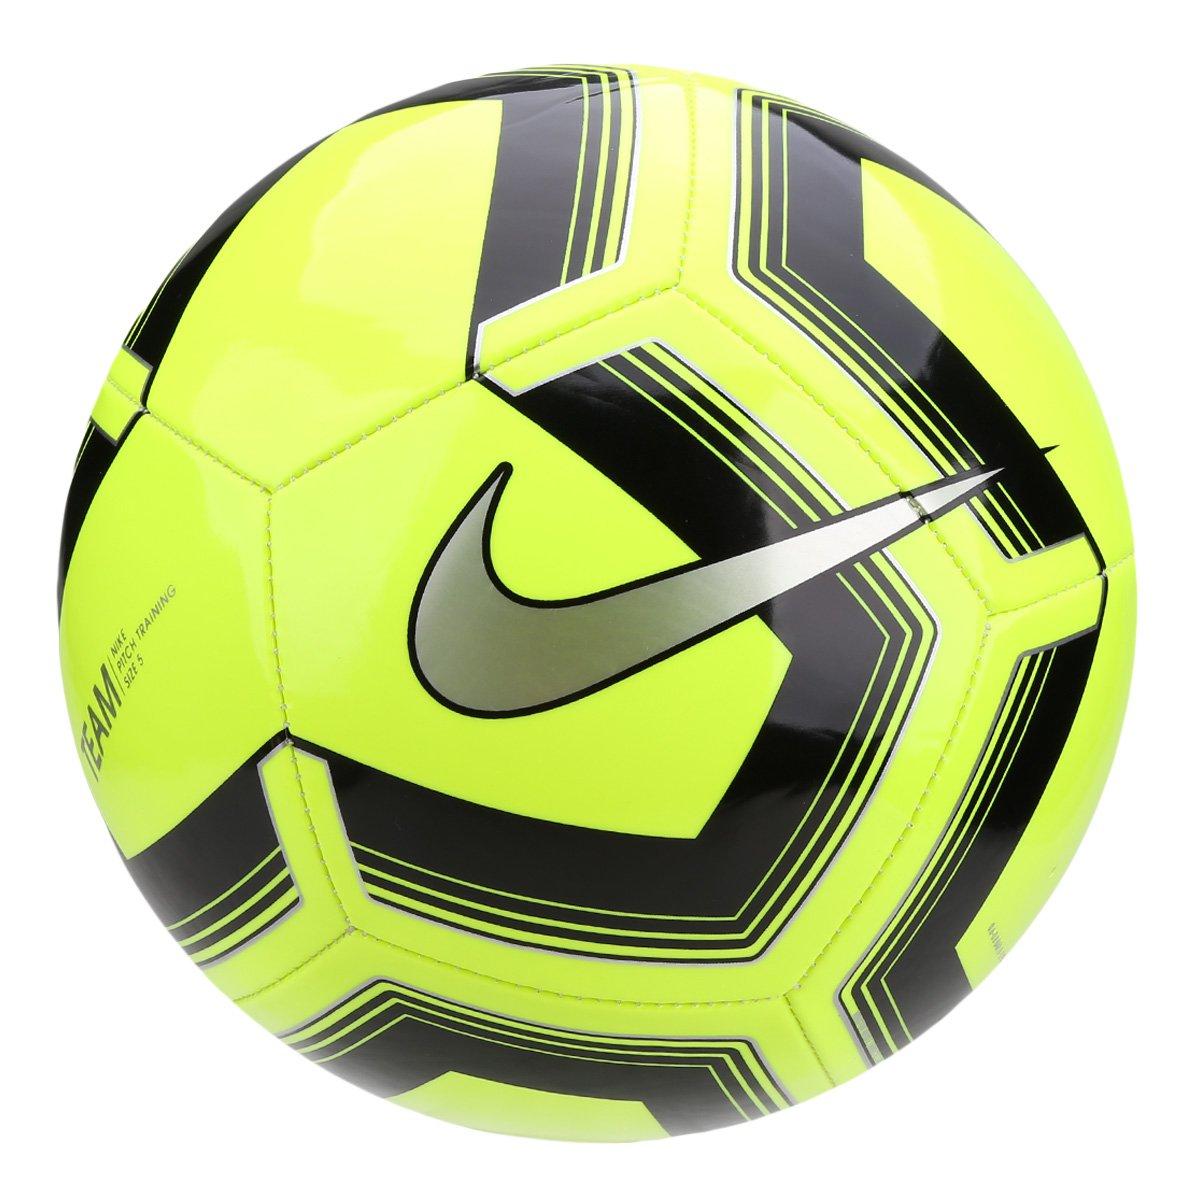 2cef3ace4ee61 Bola de Futebol Campo Nike Train Pitch II - Preto e Prata - Compre Agora